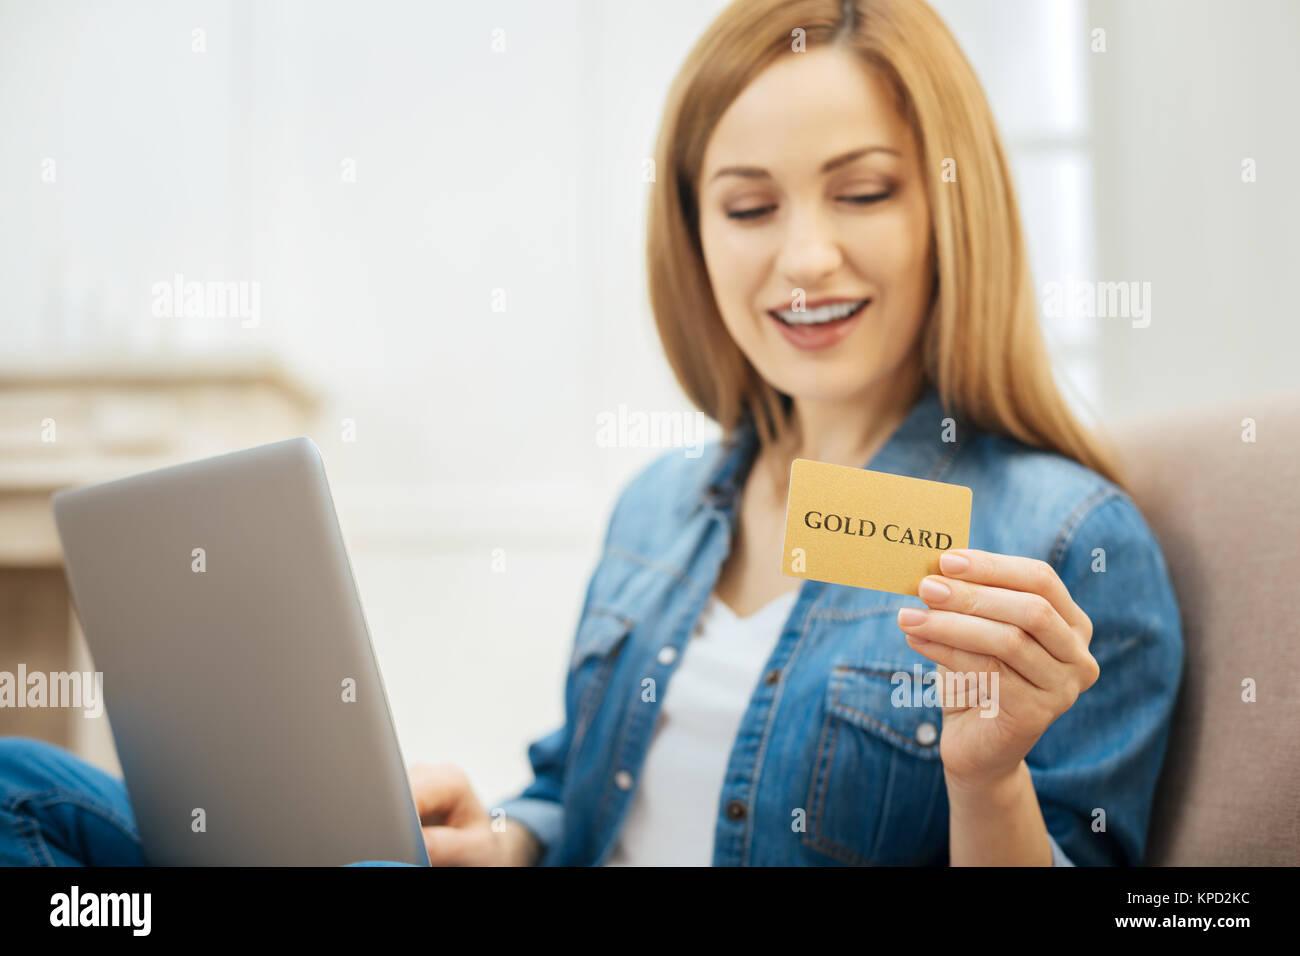 Alert Frau an ihr Gold Card suchen Stockbild